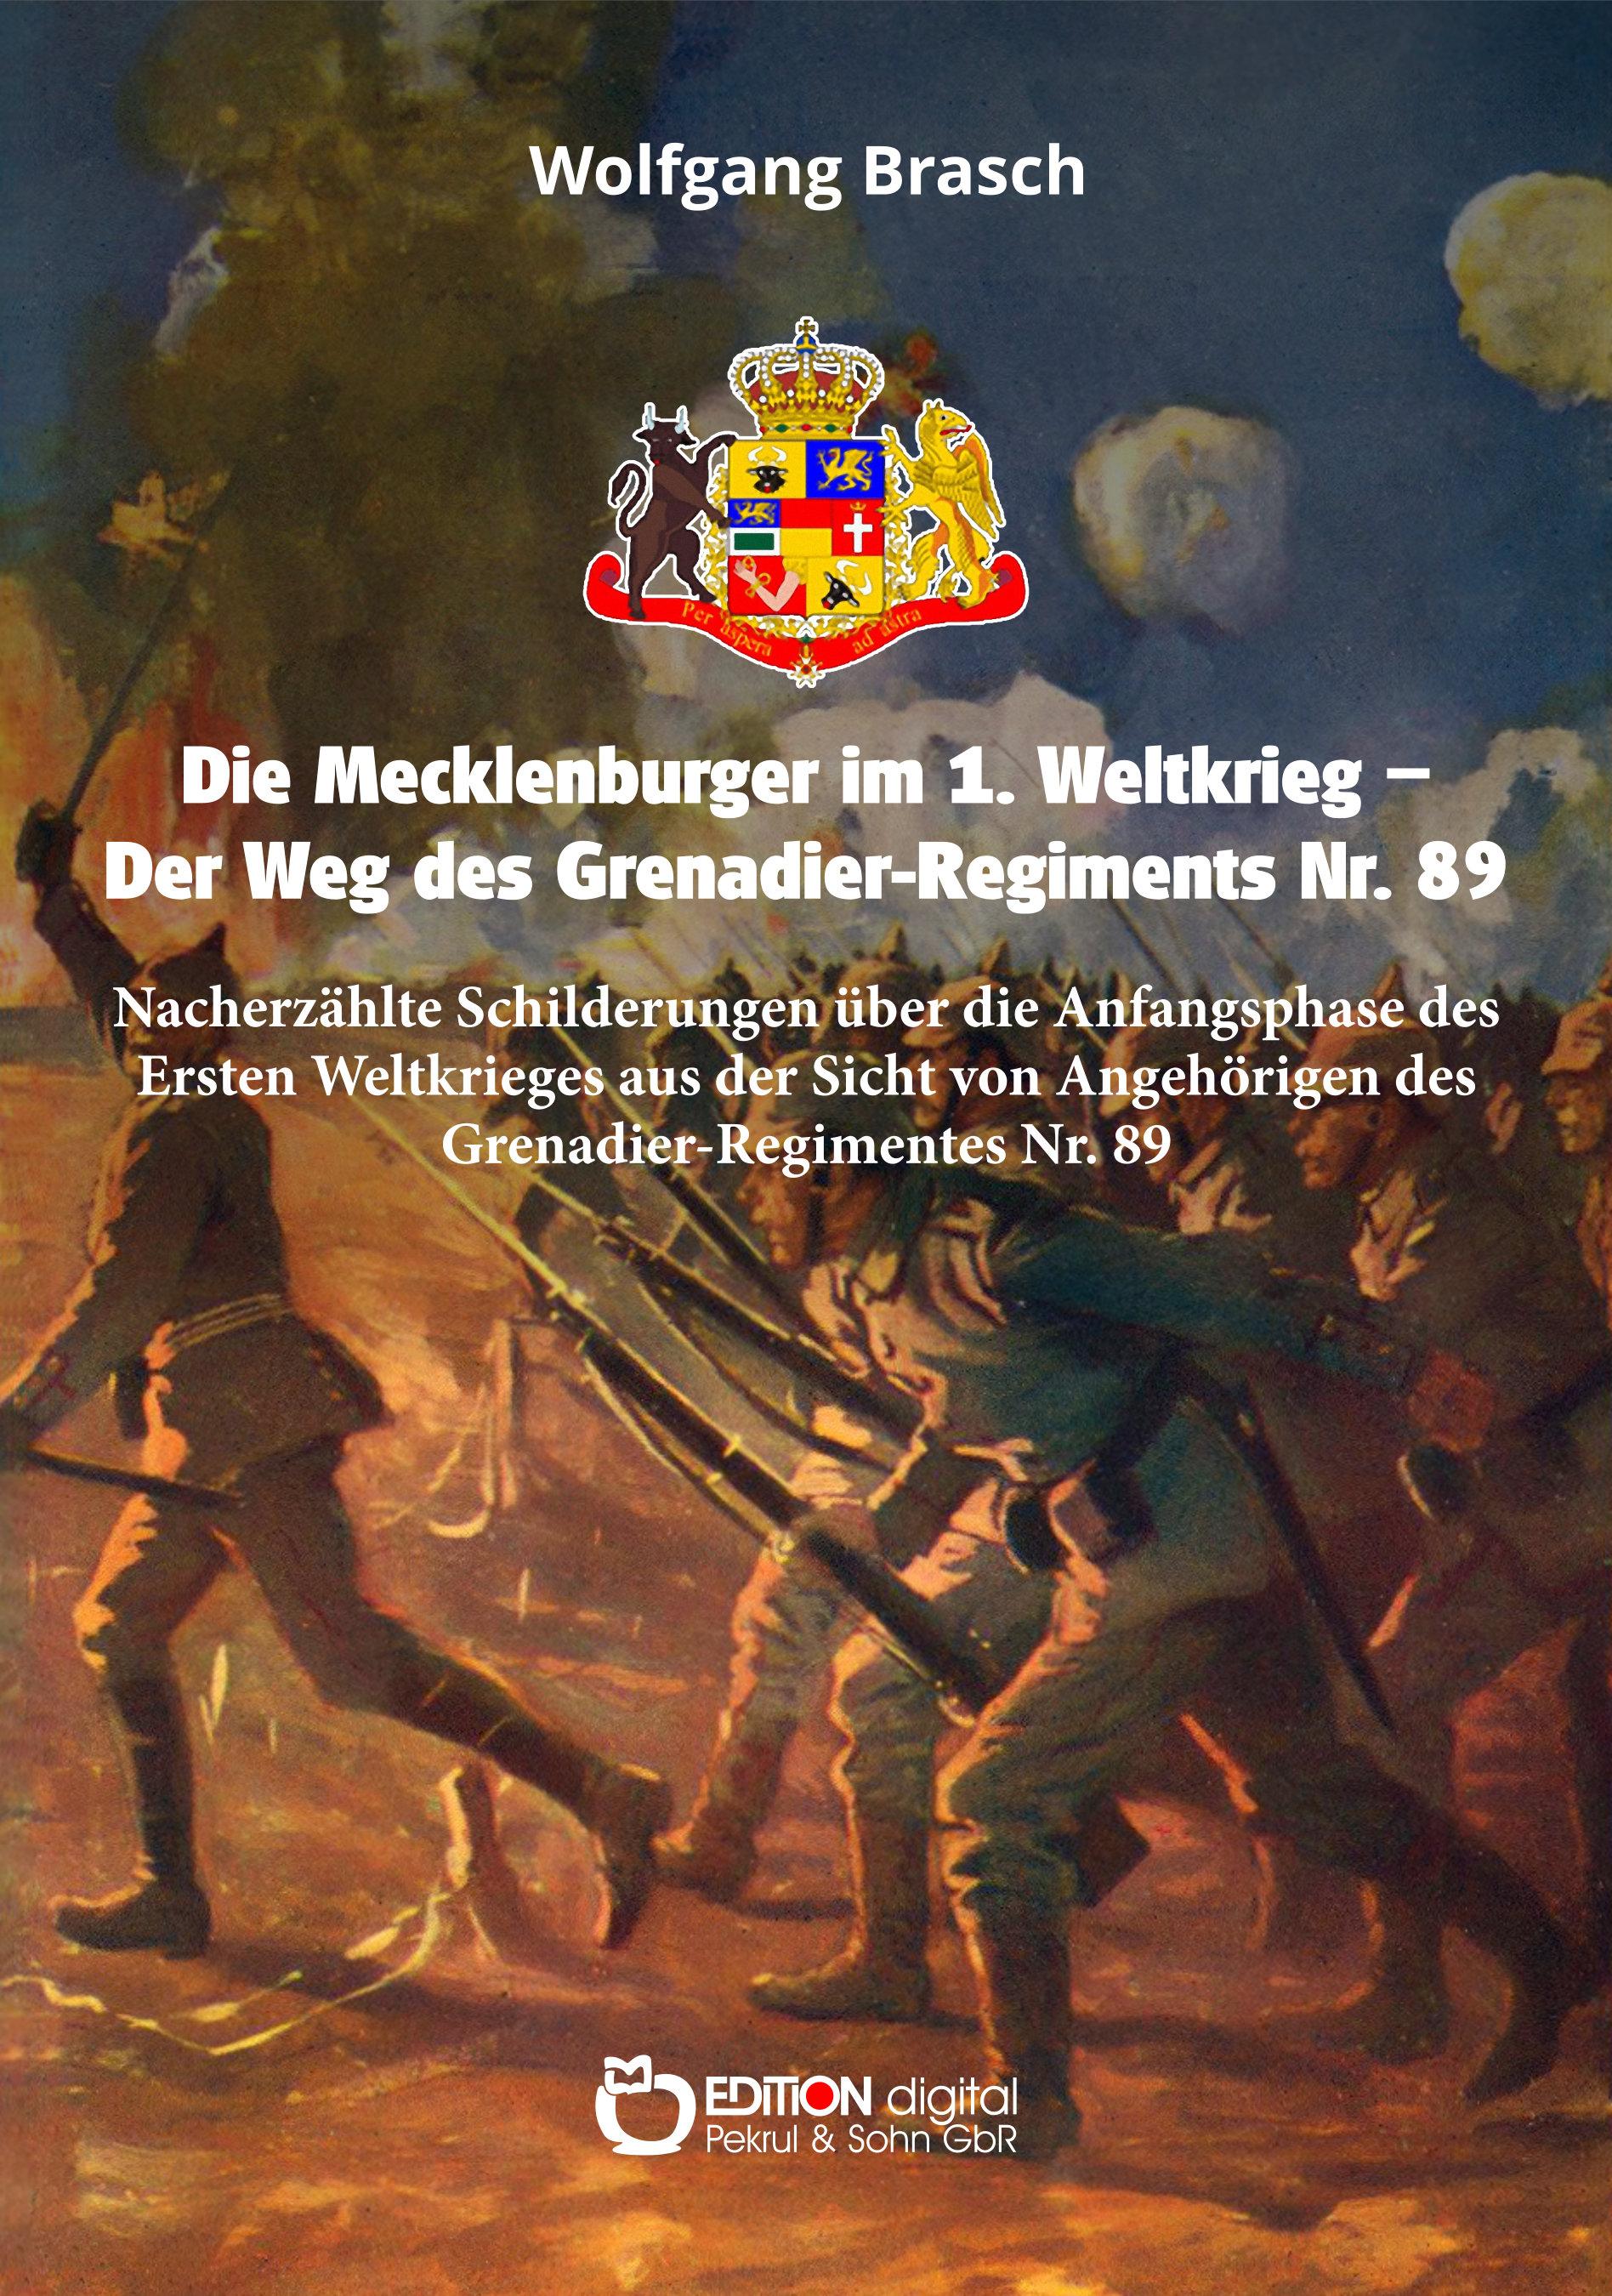 2019-05-28 Weltkrieg1